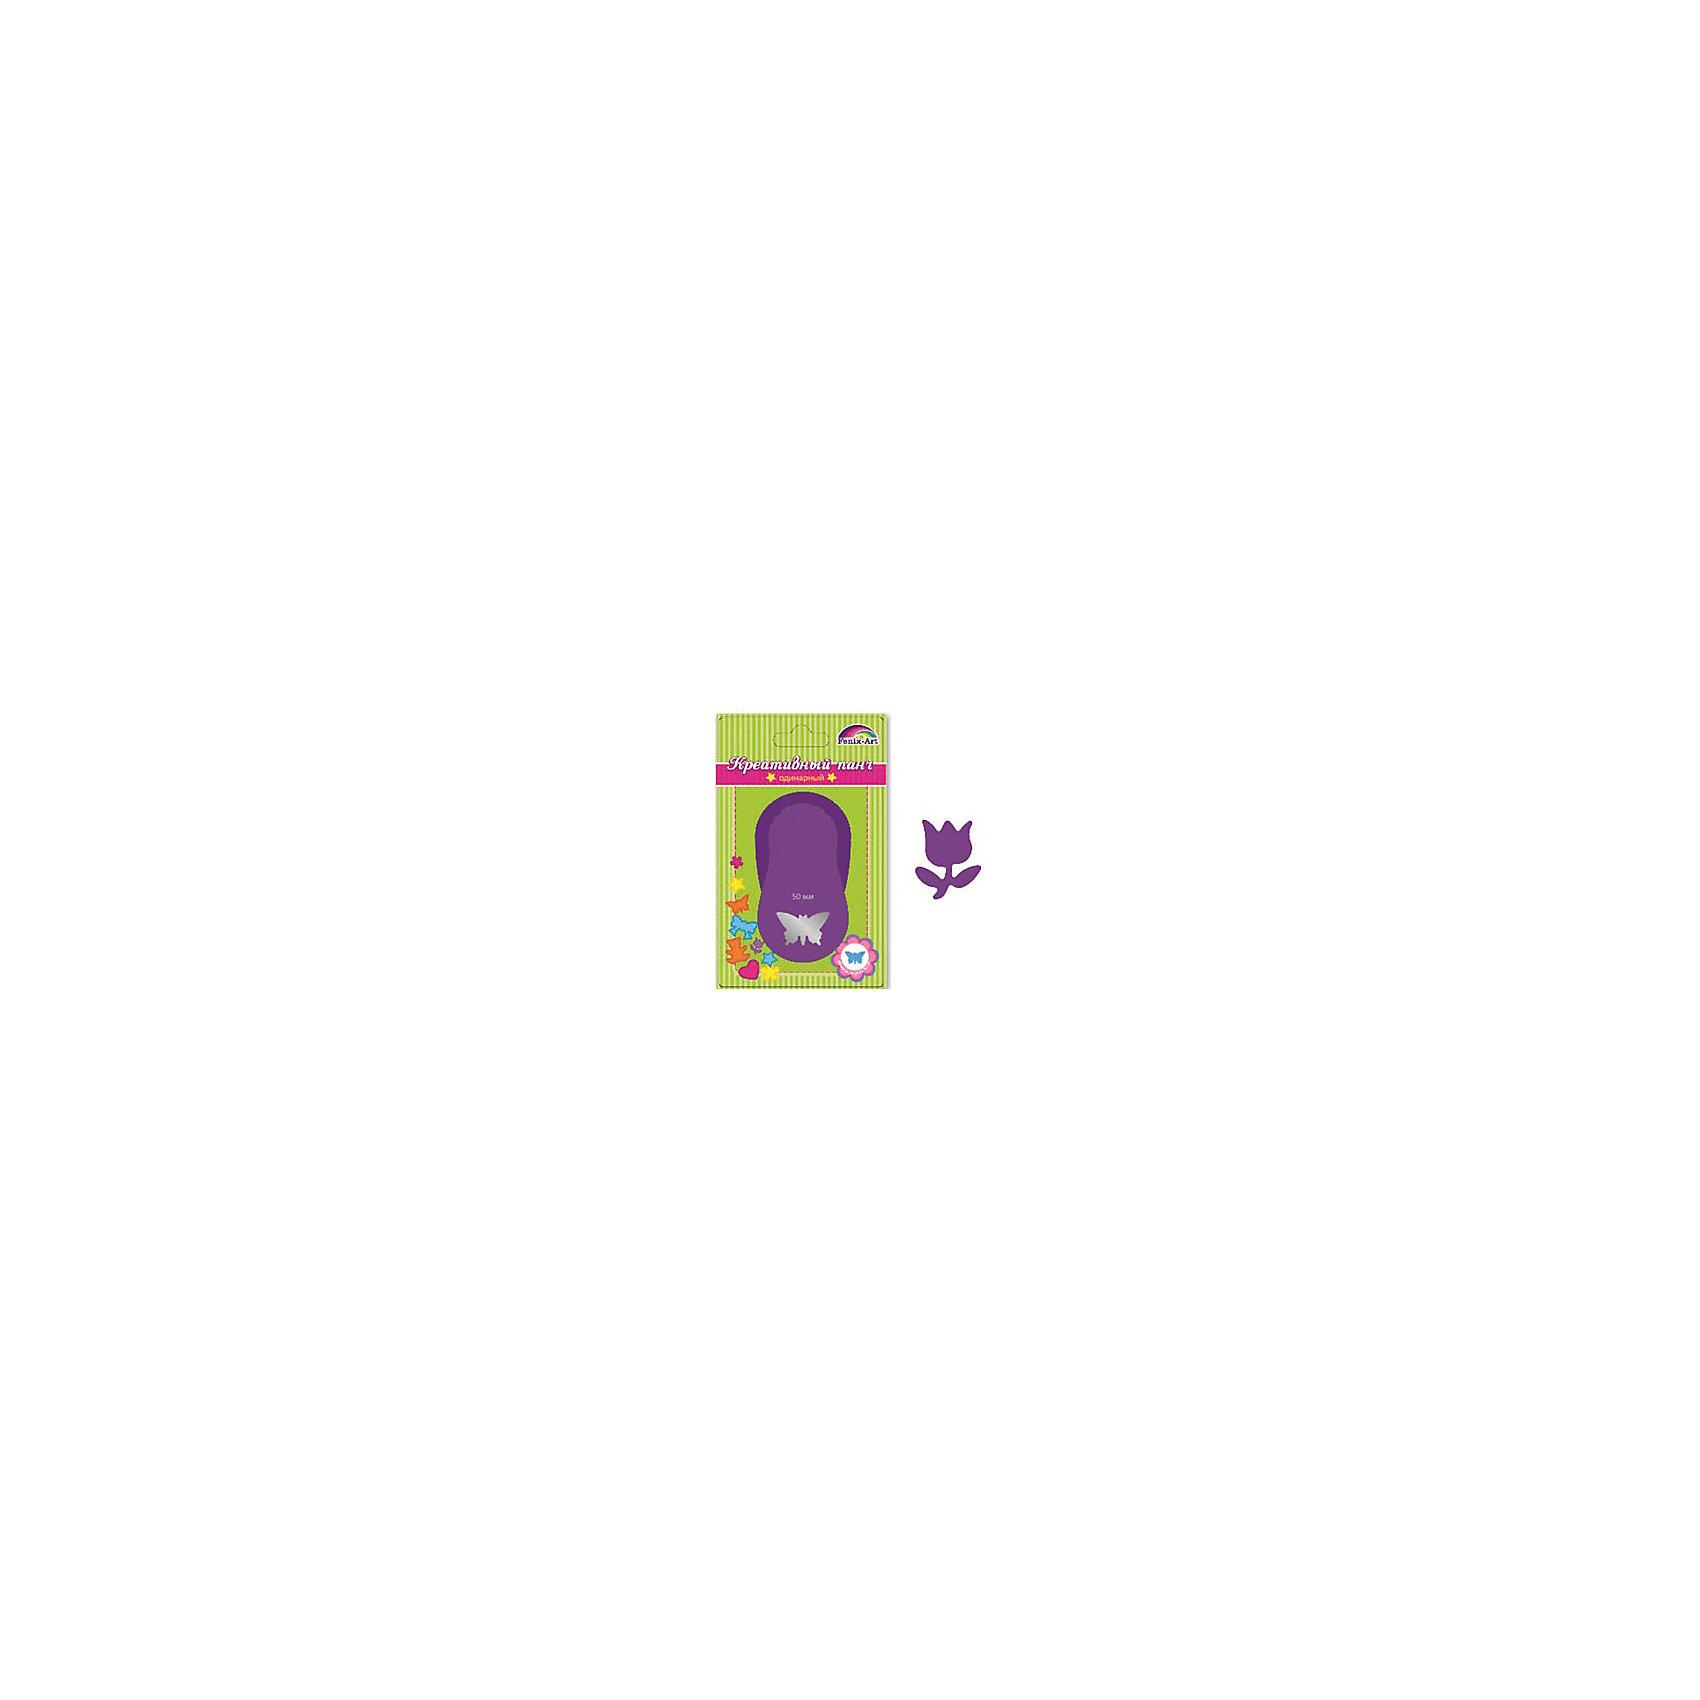 Панч-дырокол одинарный 50 мм Тюльпан Феникс+Бумага<br>Панч-дырокол одинарный ТЮЛЬПАН/50 (размер рисунка 50мм, размер панча 112х67х79, сиреневый цвет, в блистере)<br><br>Ширина мм: 180<br>Глубина мм: 110<br>Высота мм: 90<br>Вес г: 325<br>Возраст от месяцев: 72<br>Возраст до месяцев: 2147483647<br>Пол: Унисекс<br>Возраст: Детский<br>SKU: 7046283